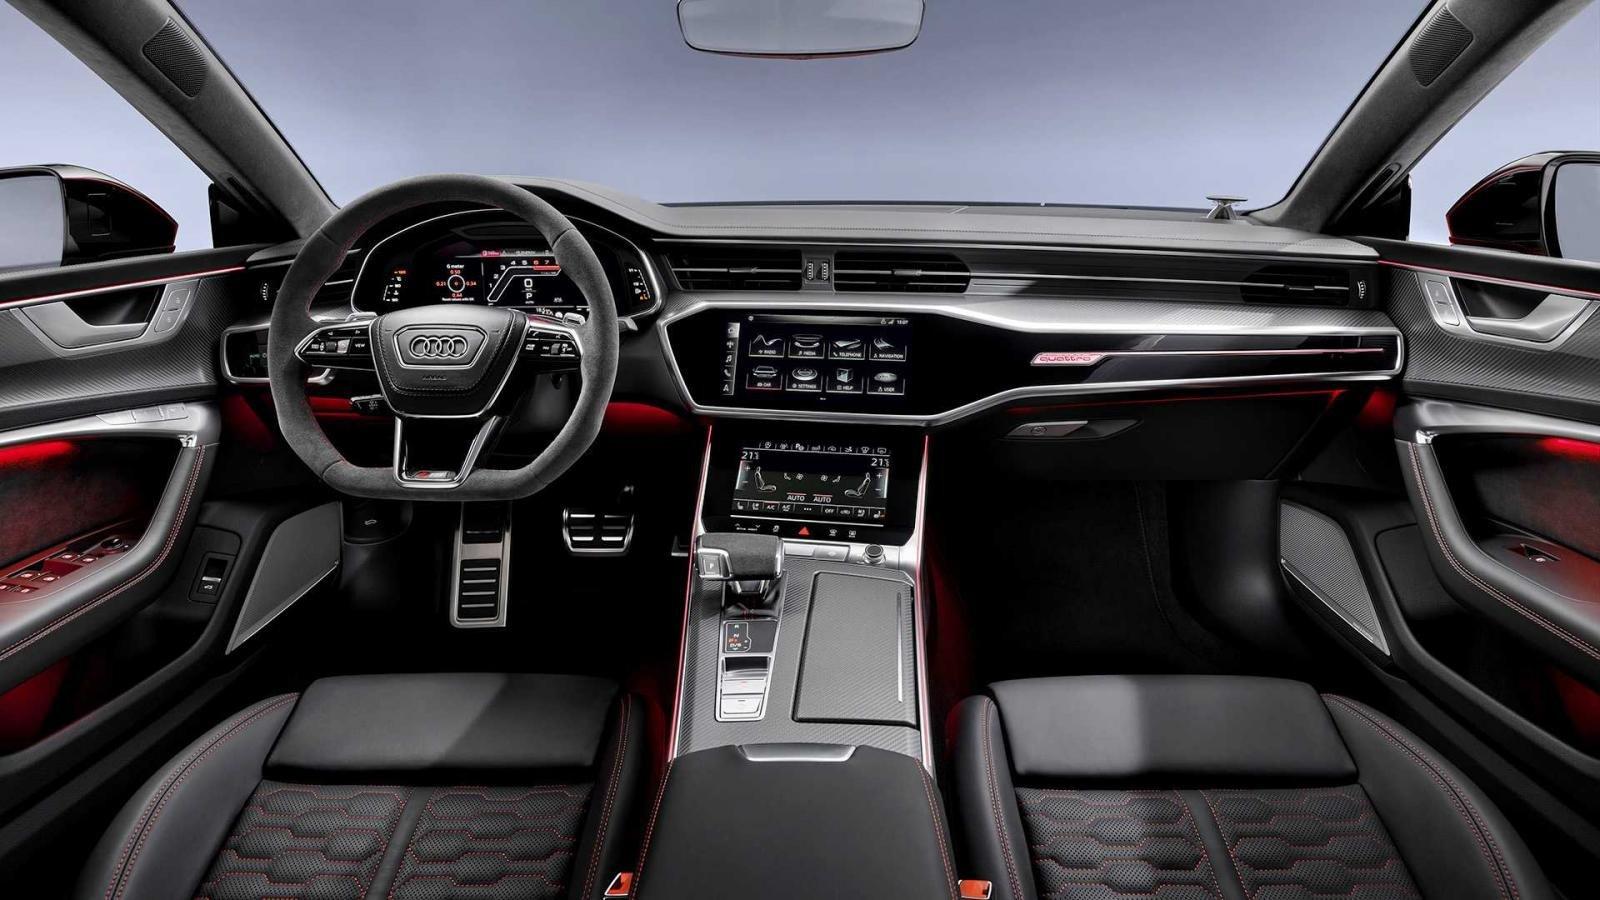 Nội thất Audi RS7 Sportback bọc da Nappa cao cấp.